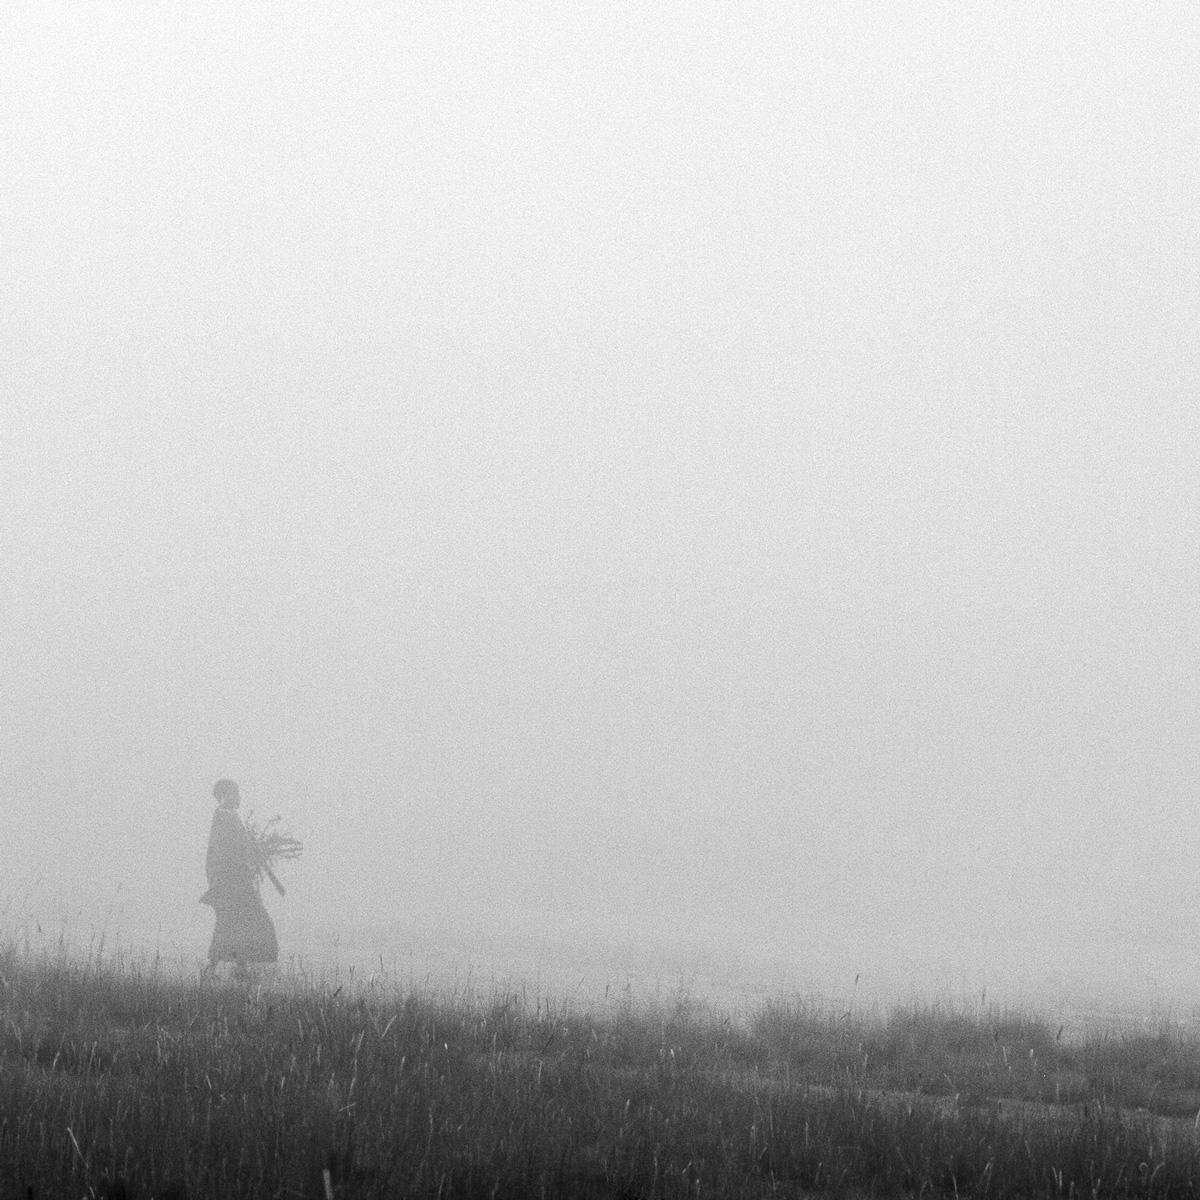 Masai-in-mist